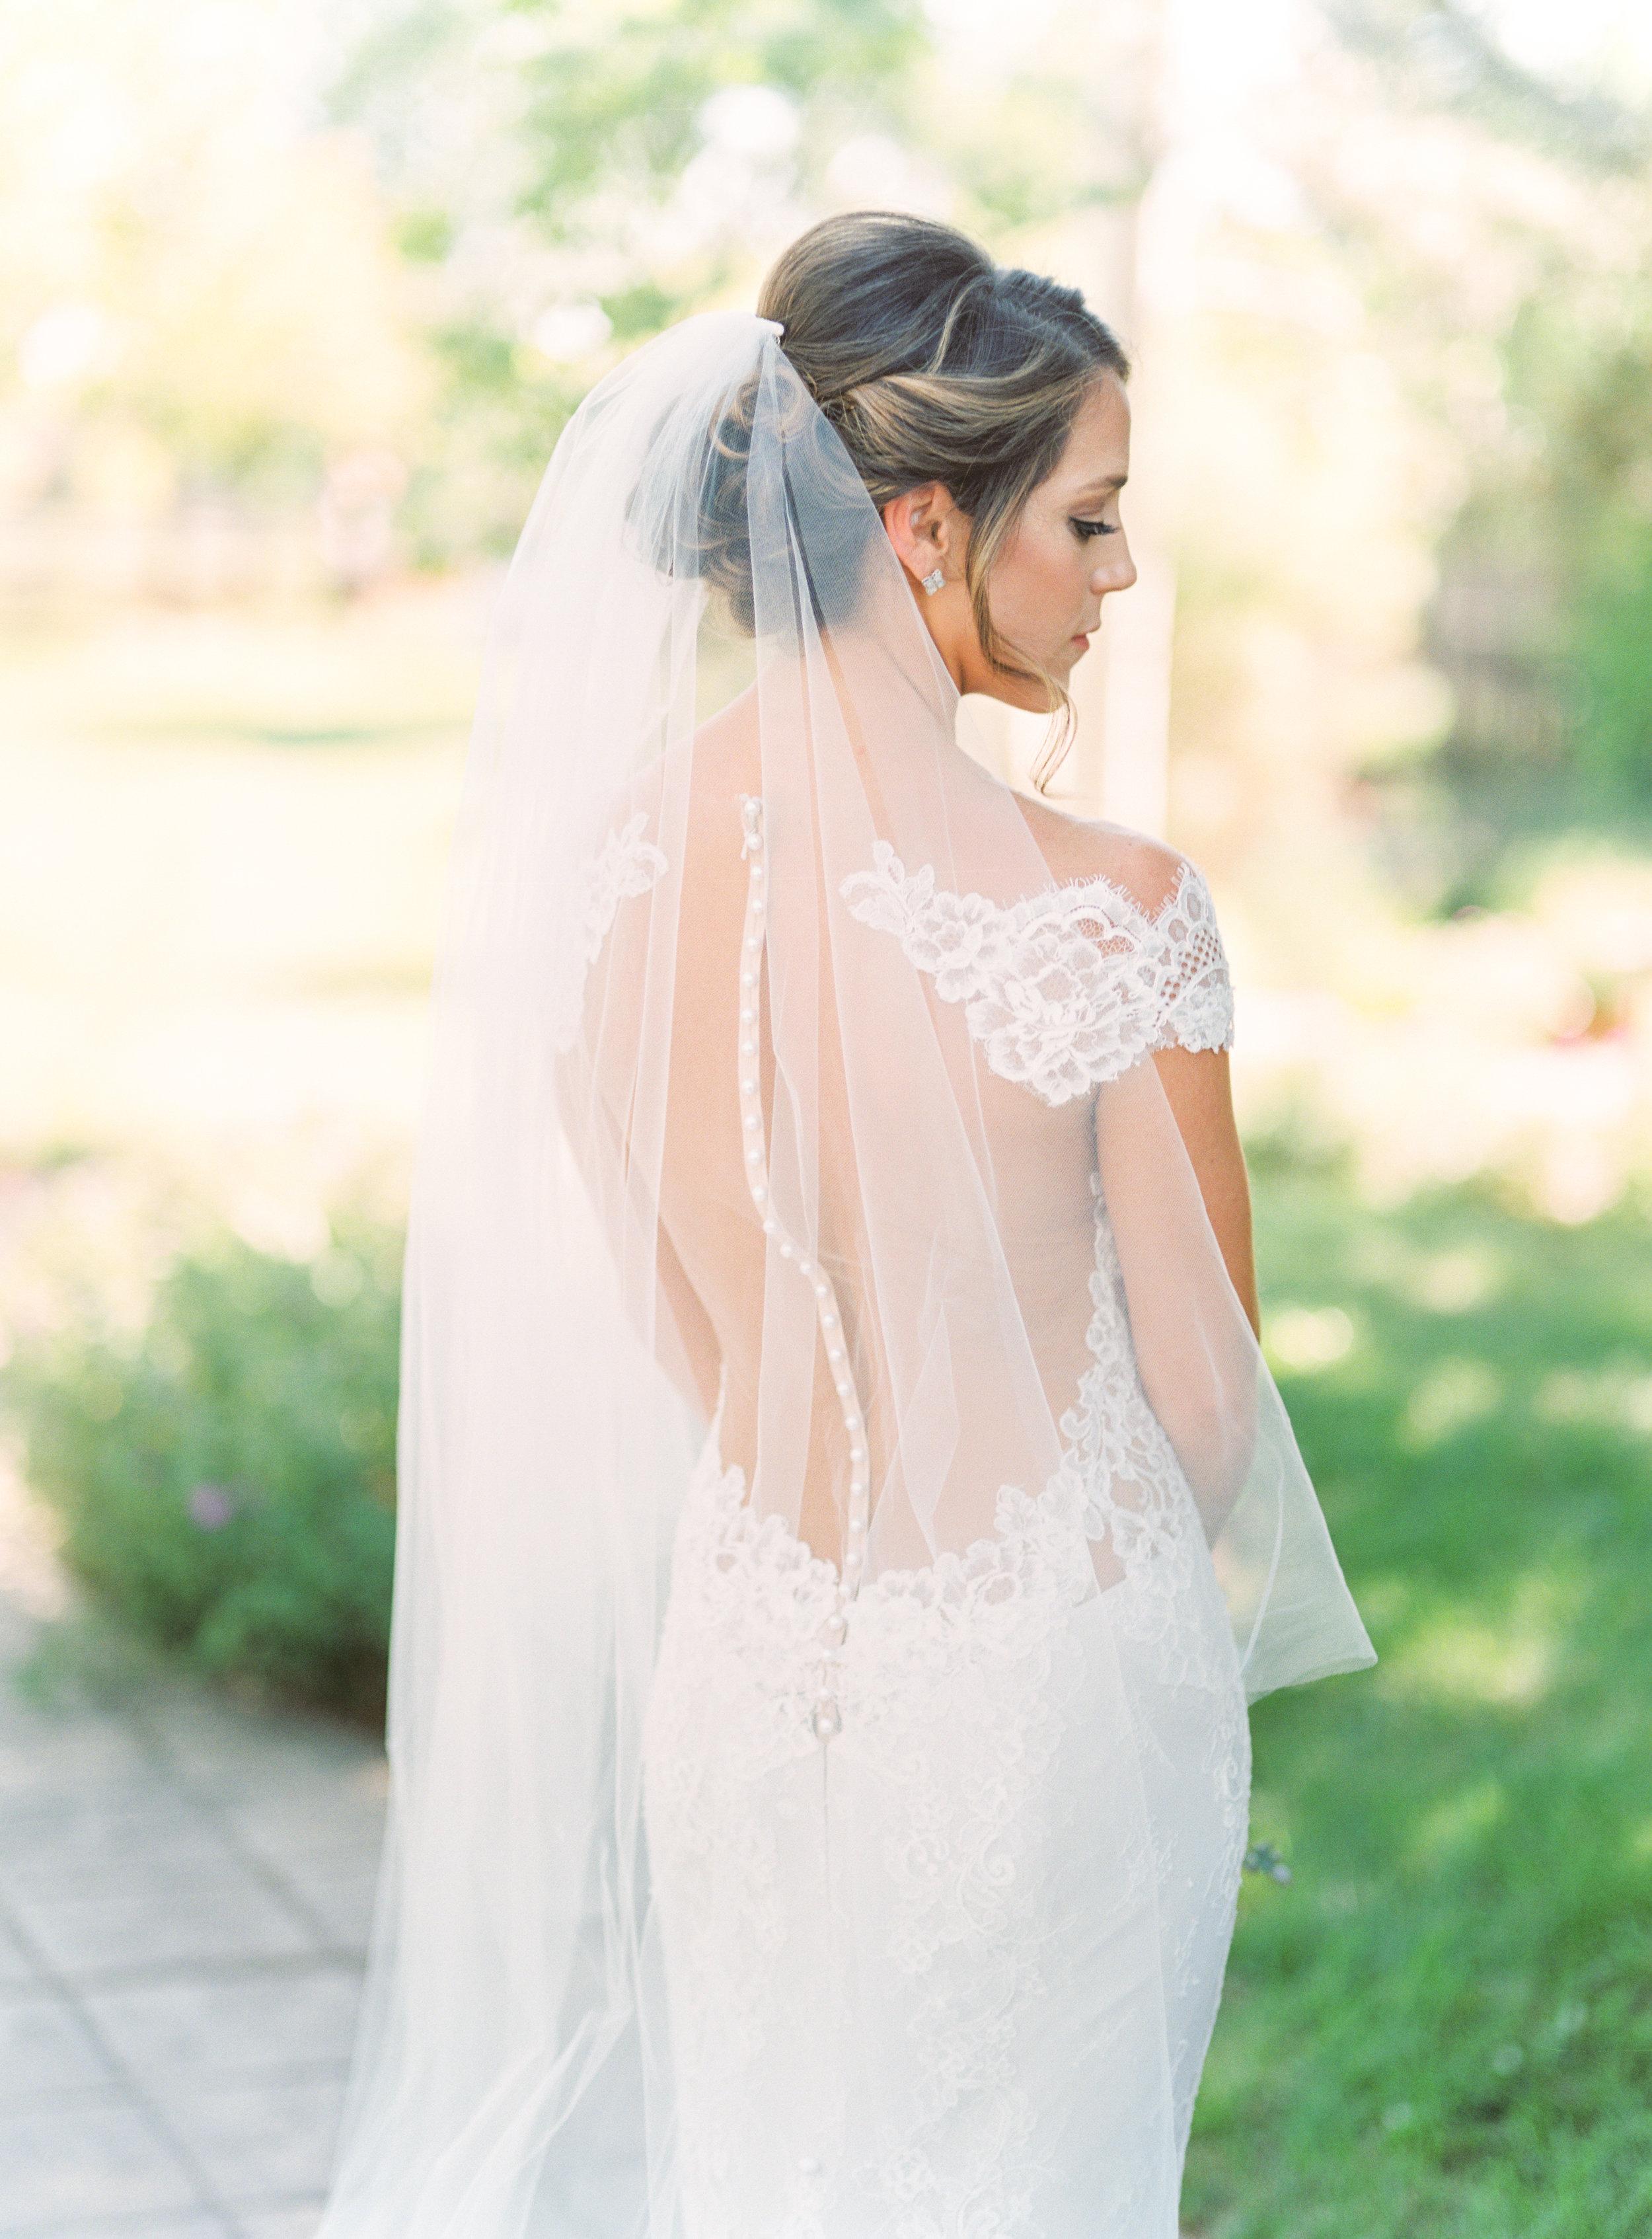 Kathryn-Allen-Boulder-wedding-2018-by-Lisa-ODwyer-136.jpg